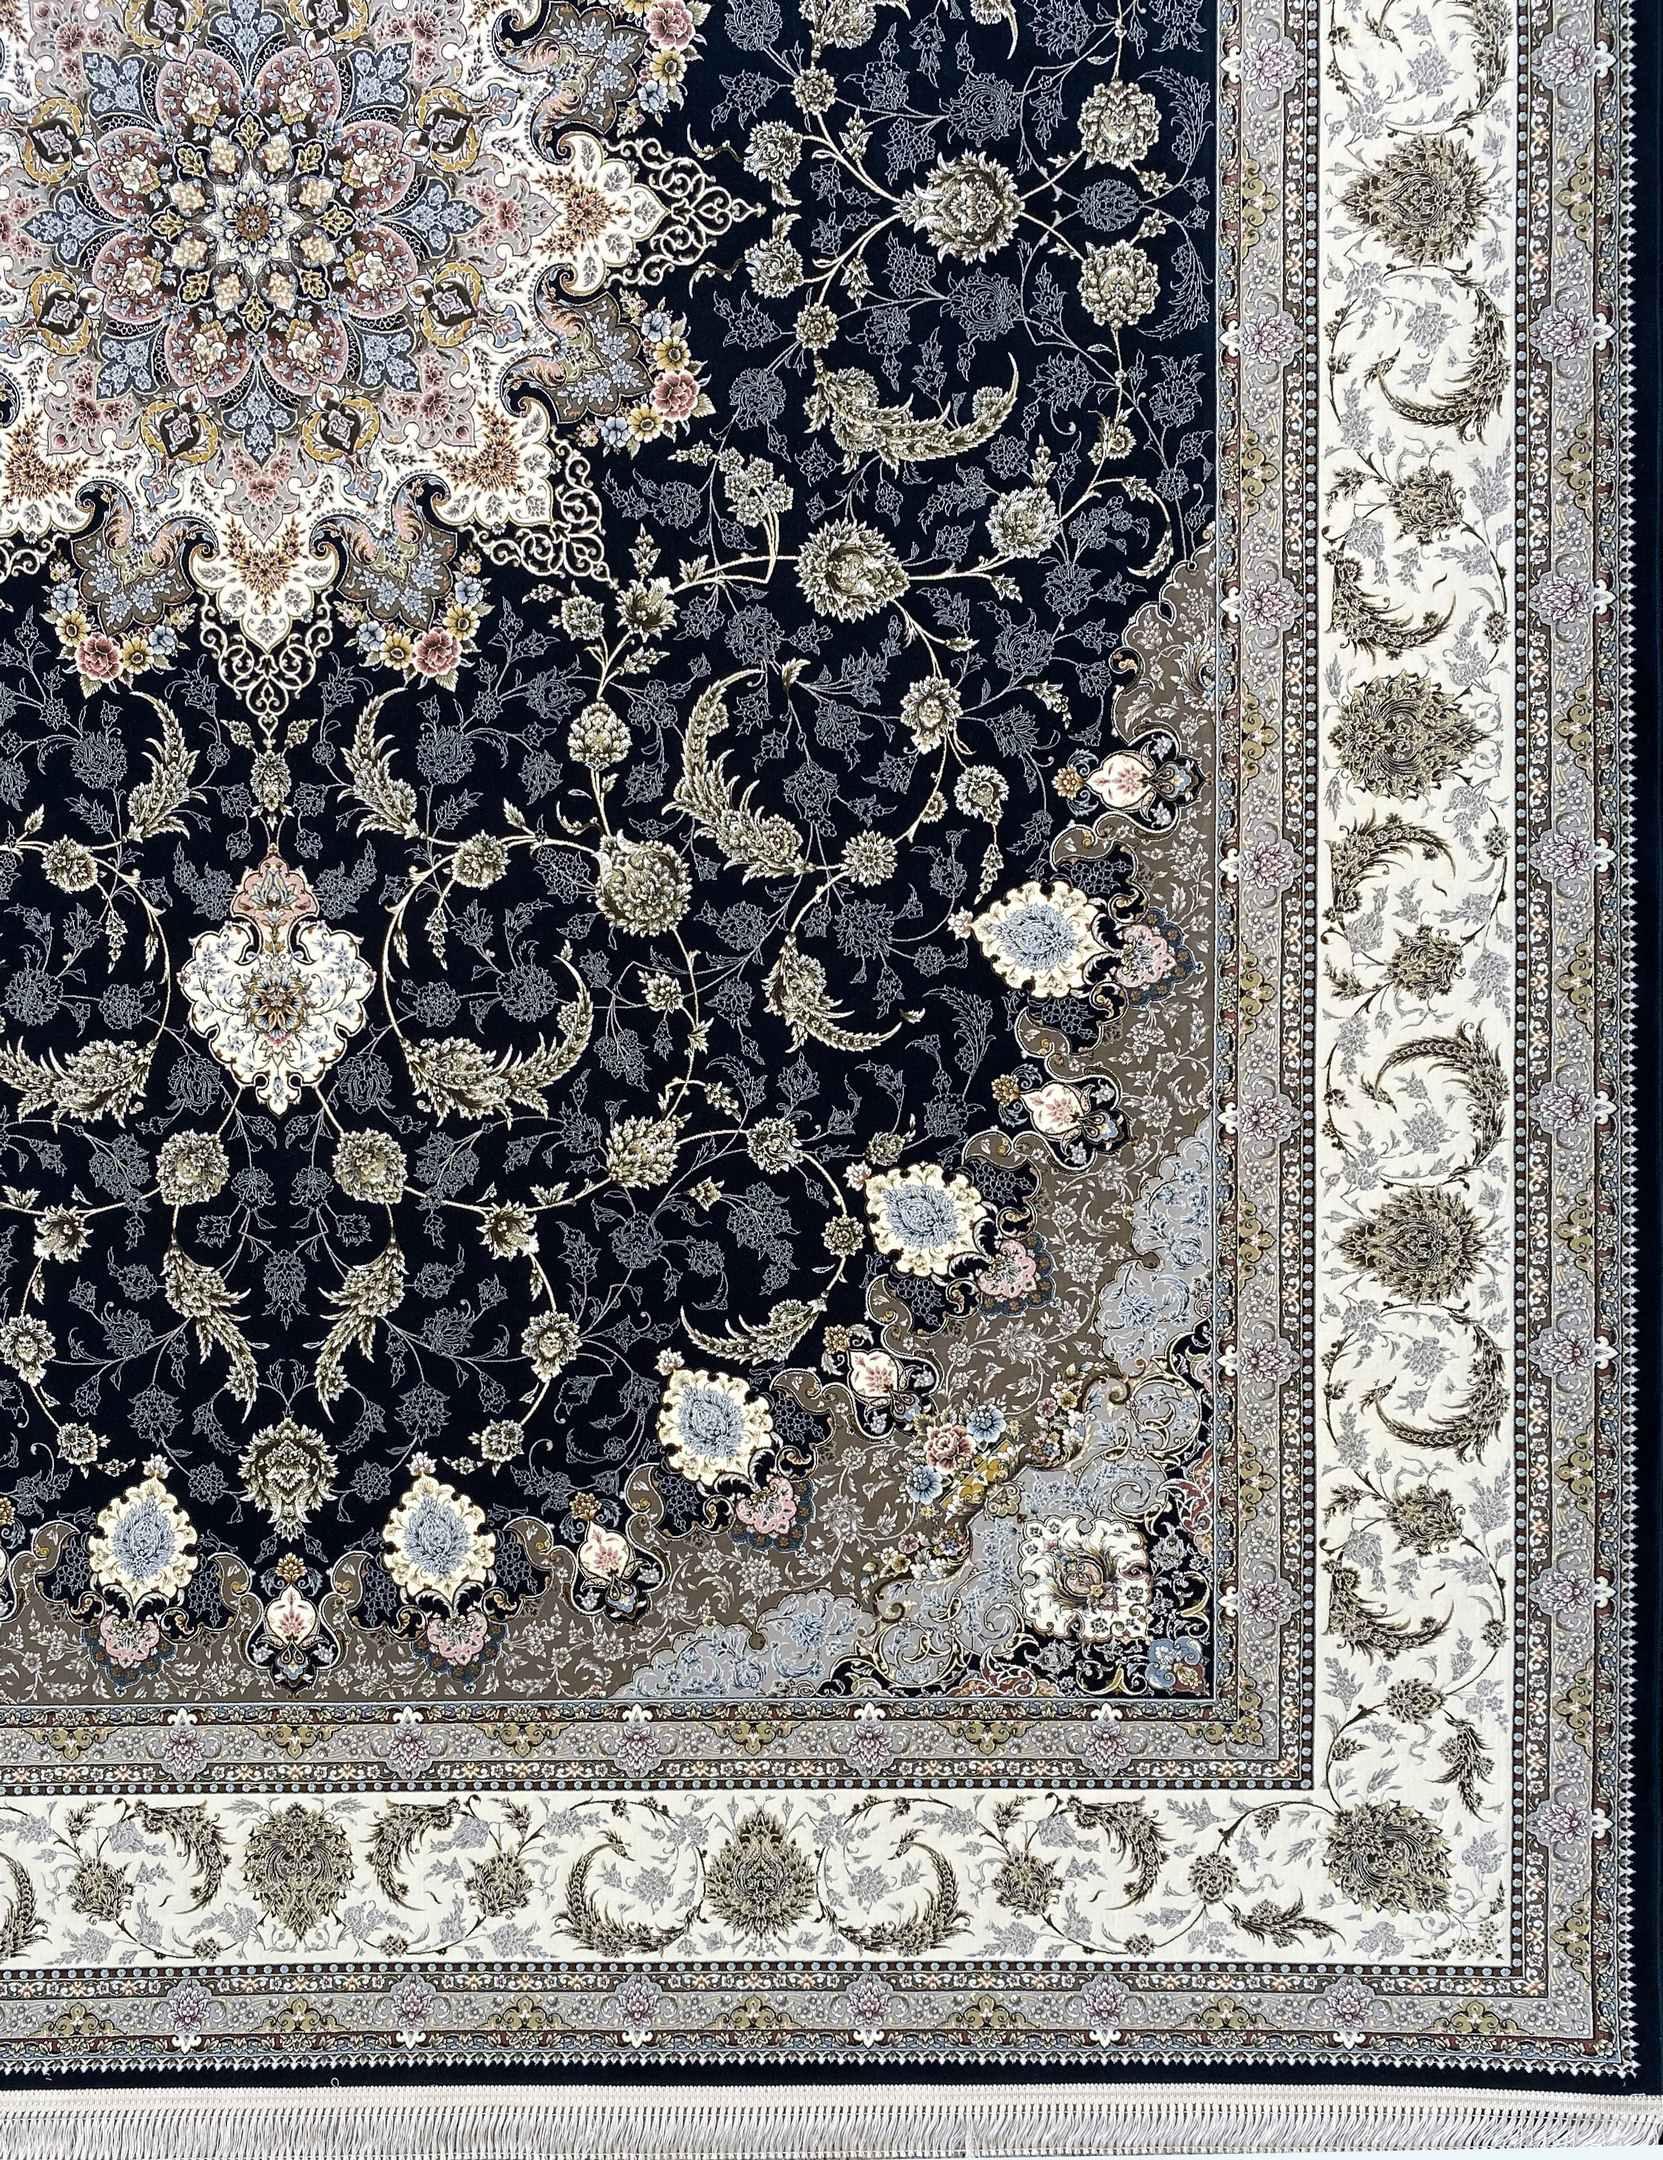 فرش 1500 شانه اصفهان